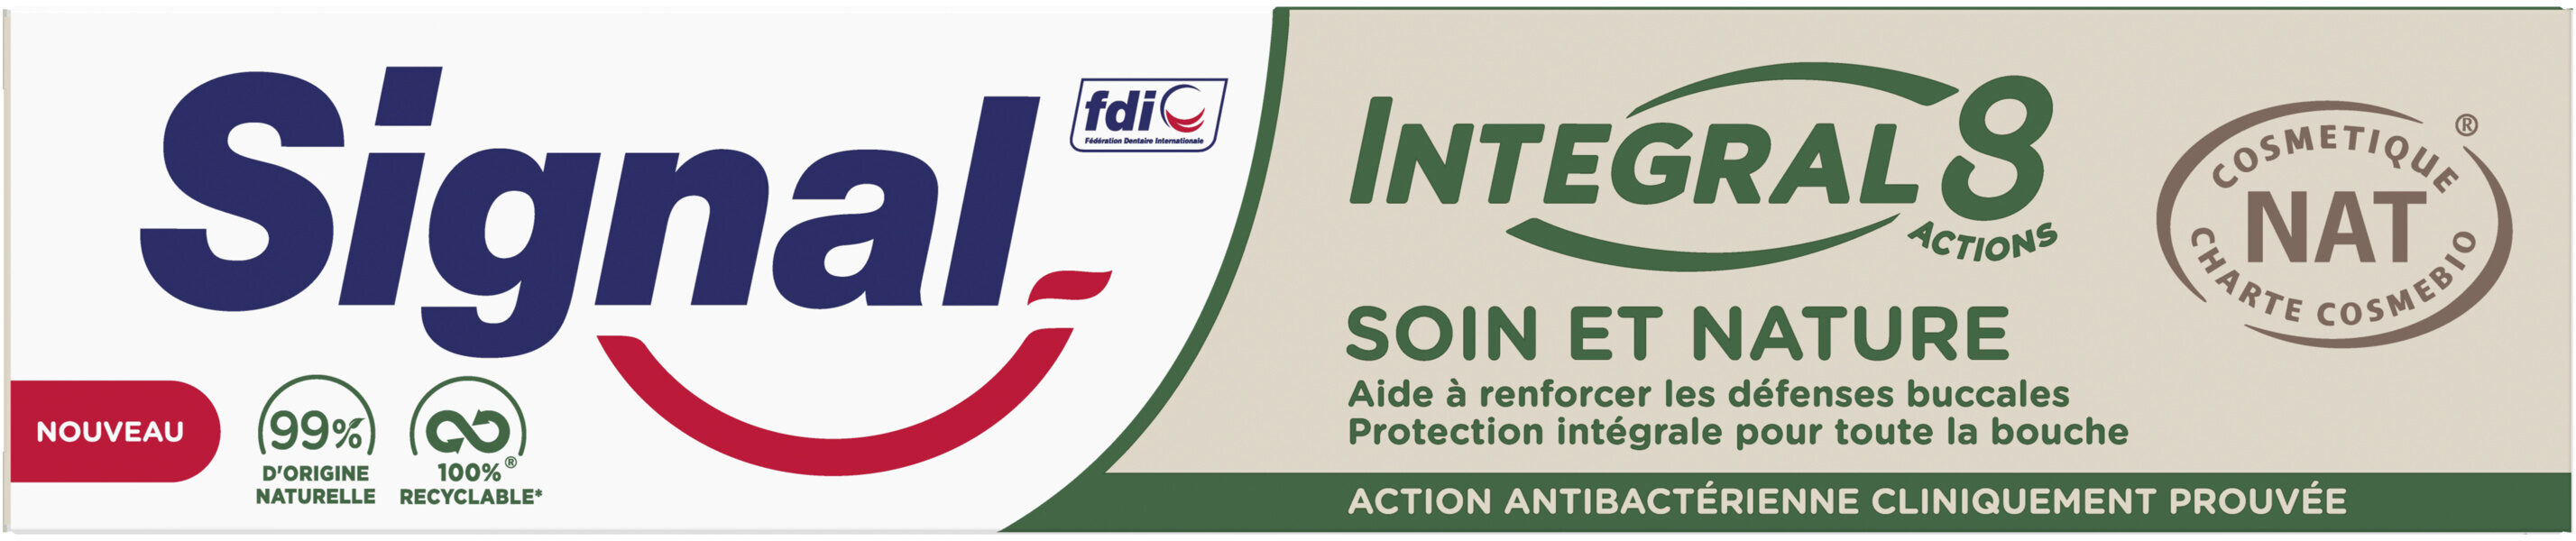 Signal Dentifrice Integral 8 Soin & Nature - Produit - fr